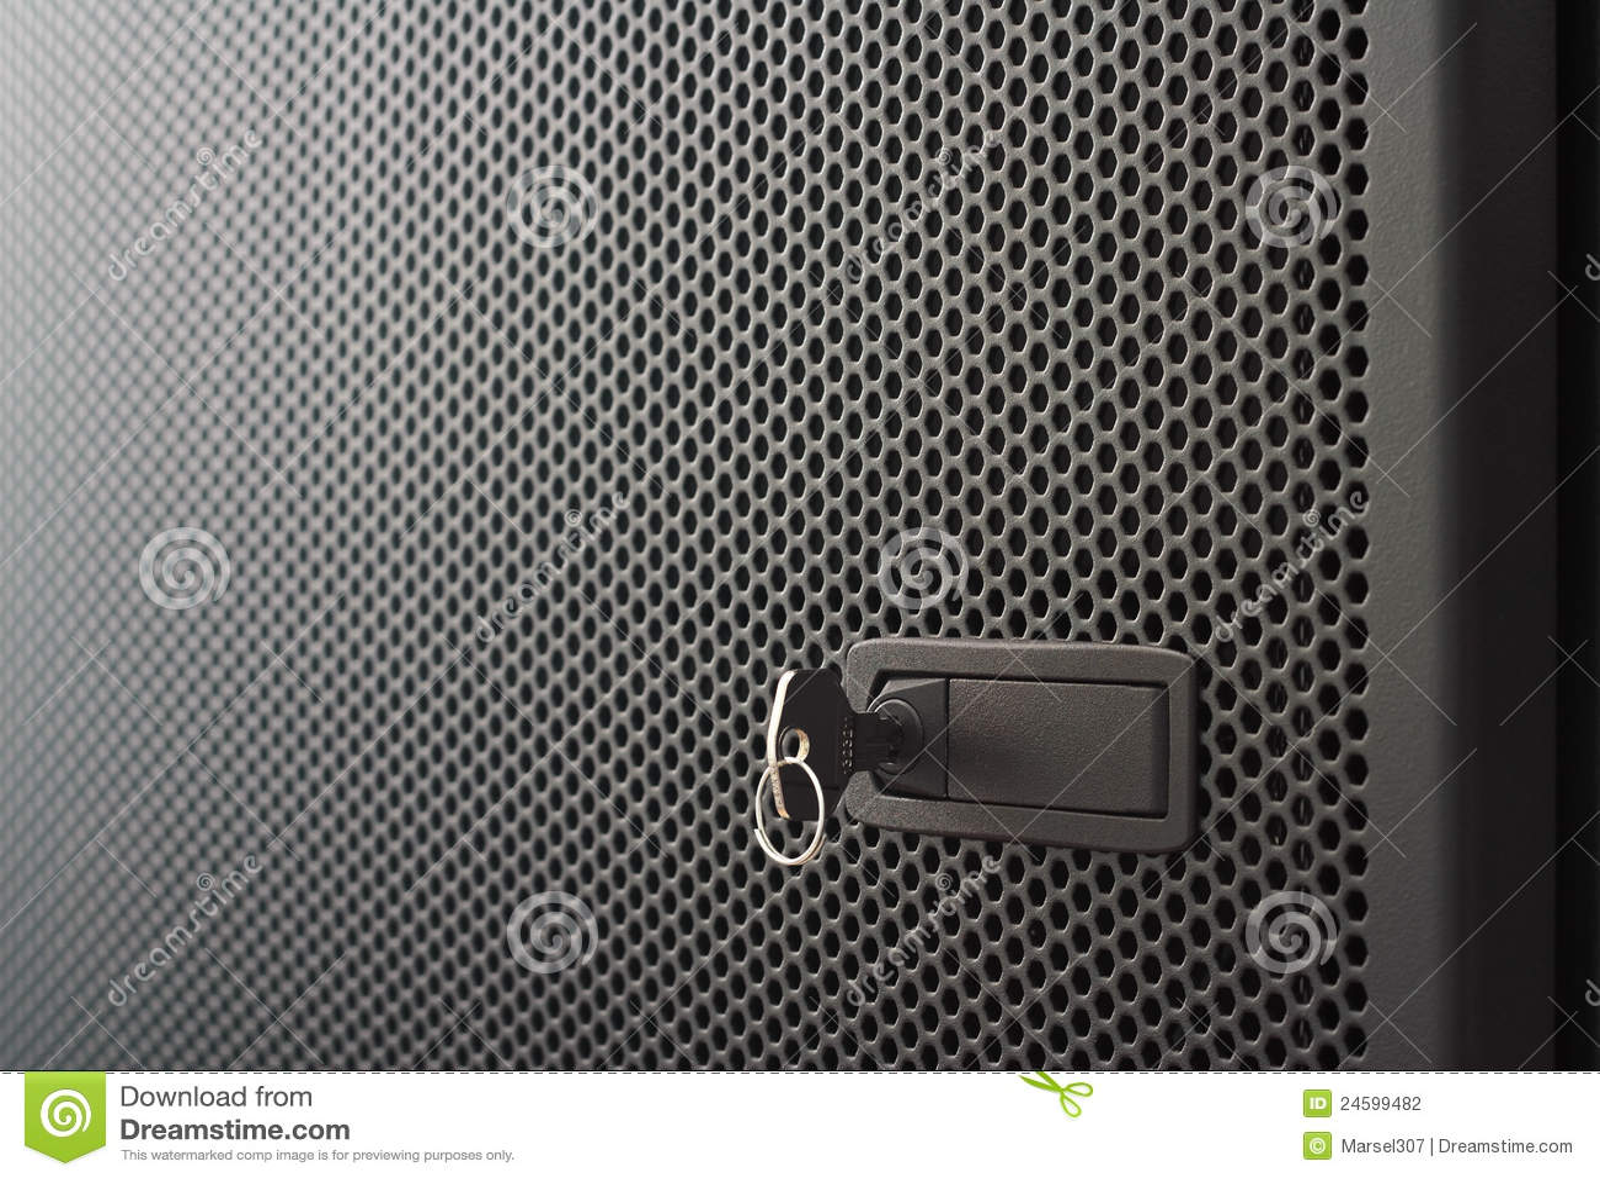 Perforated Metal Door Stock Photo Image Of Shining Lock